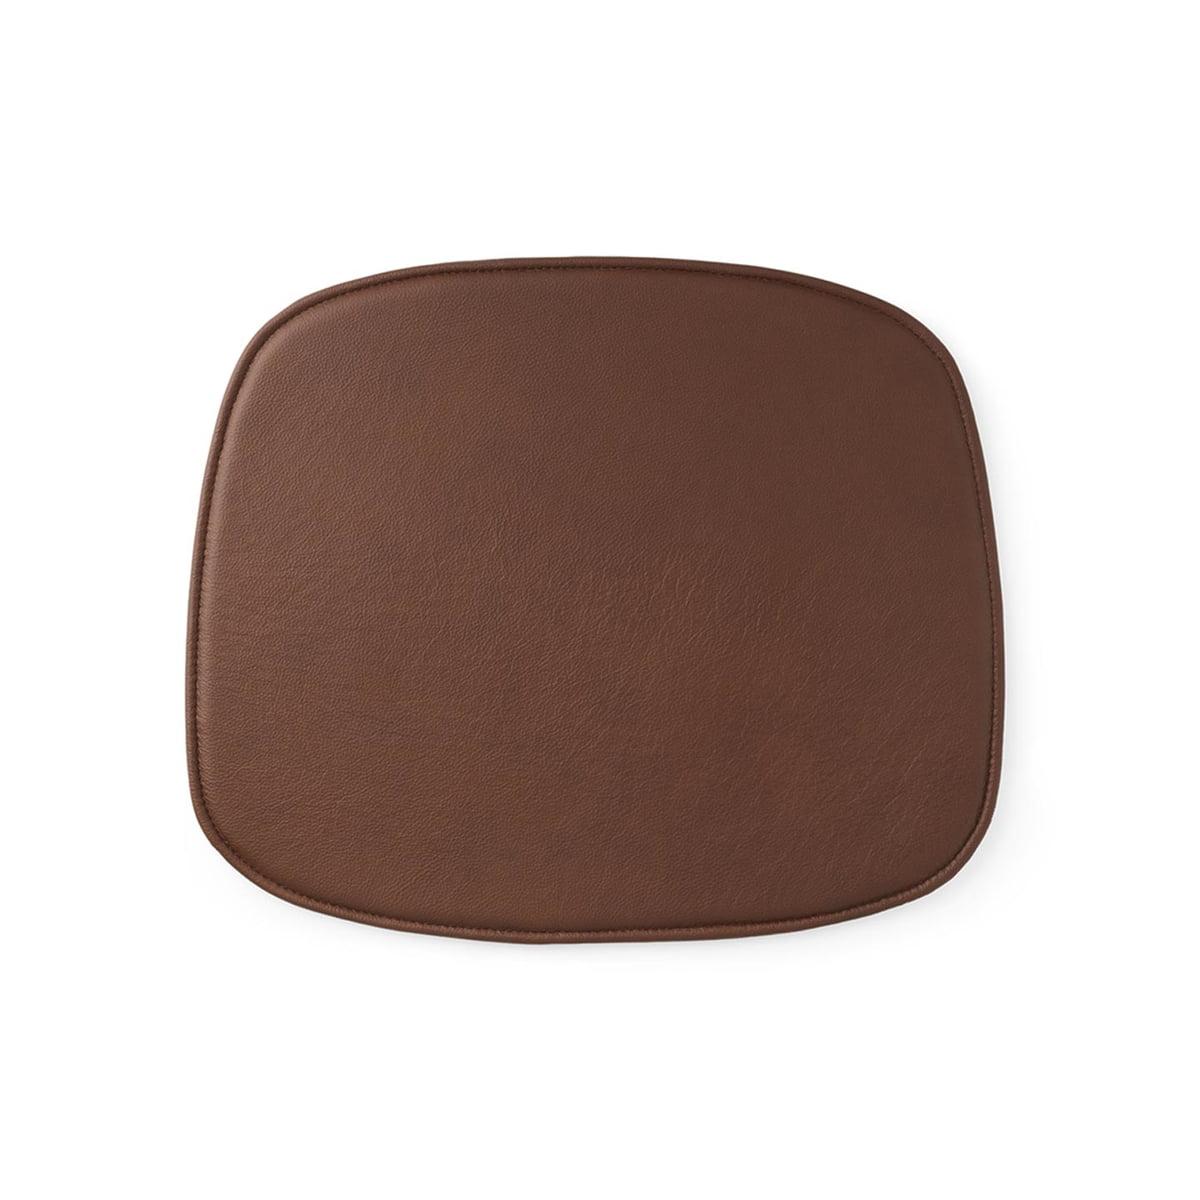 Normann Copenhagen - Sitzkissen zum Form Stuhl, Leder brandy